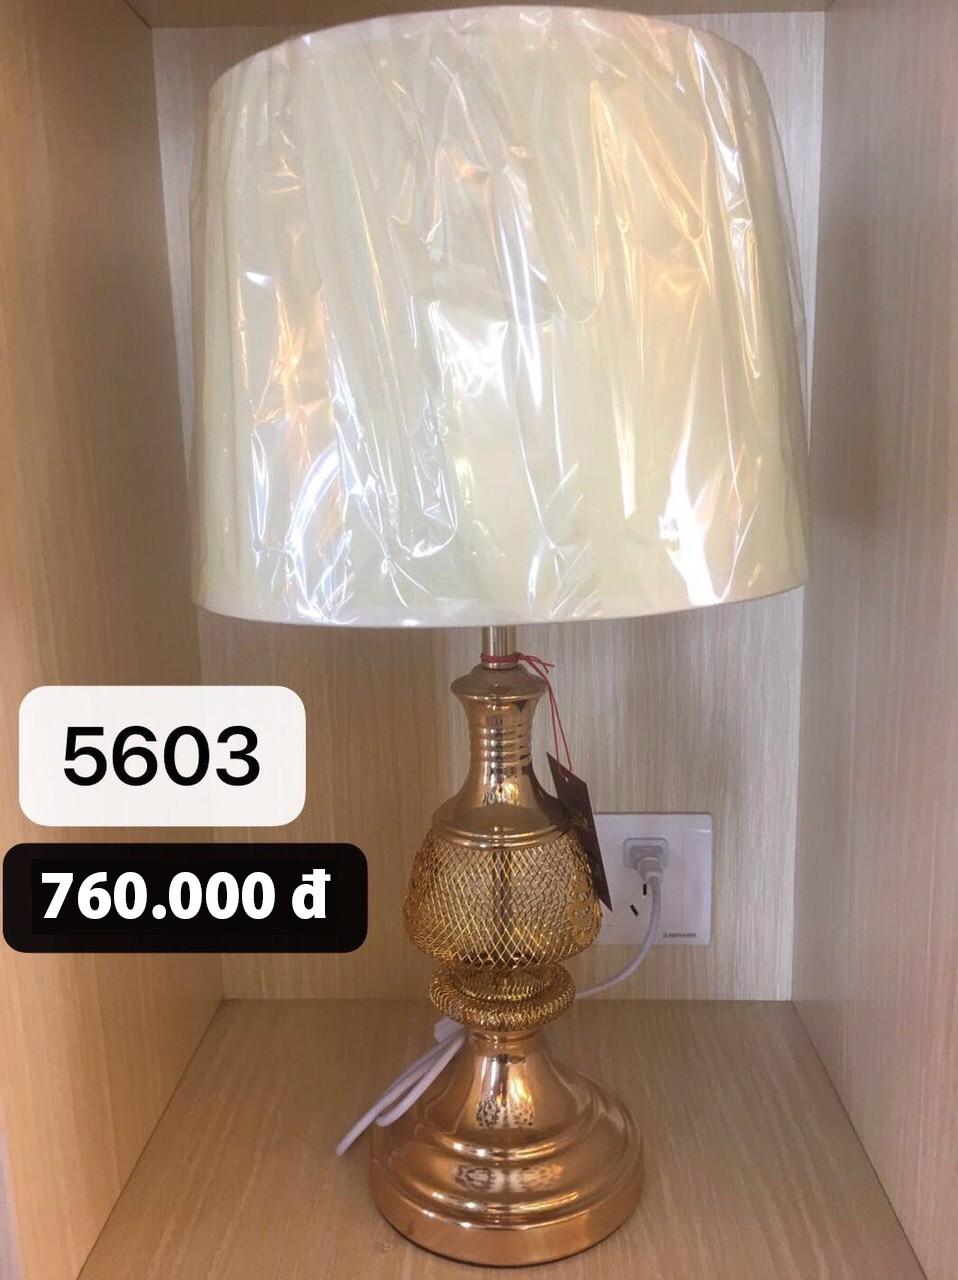 den-ban-htdb-5603